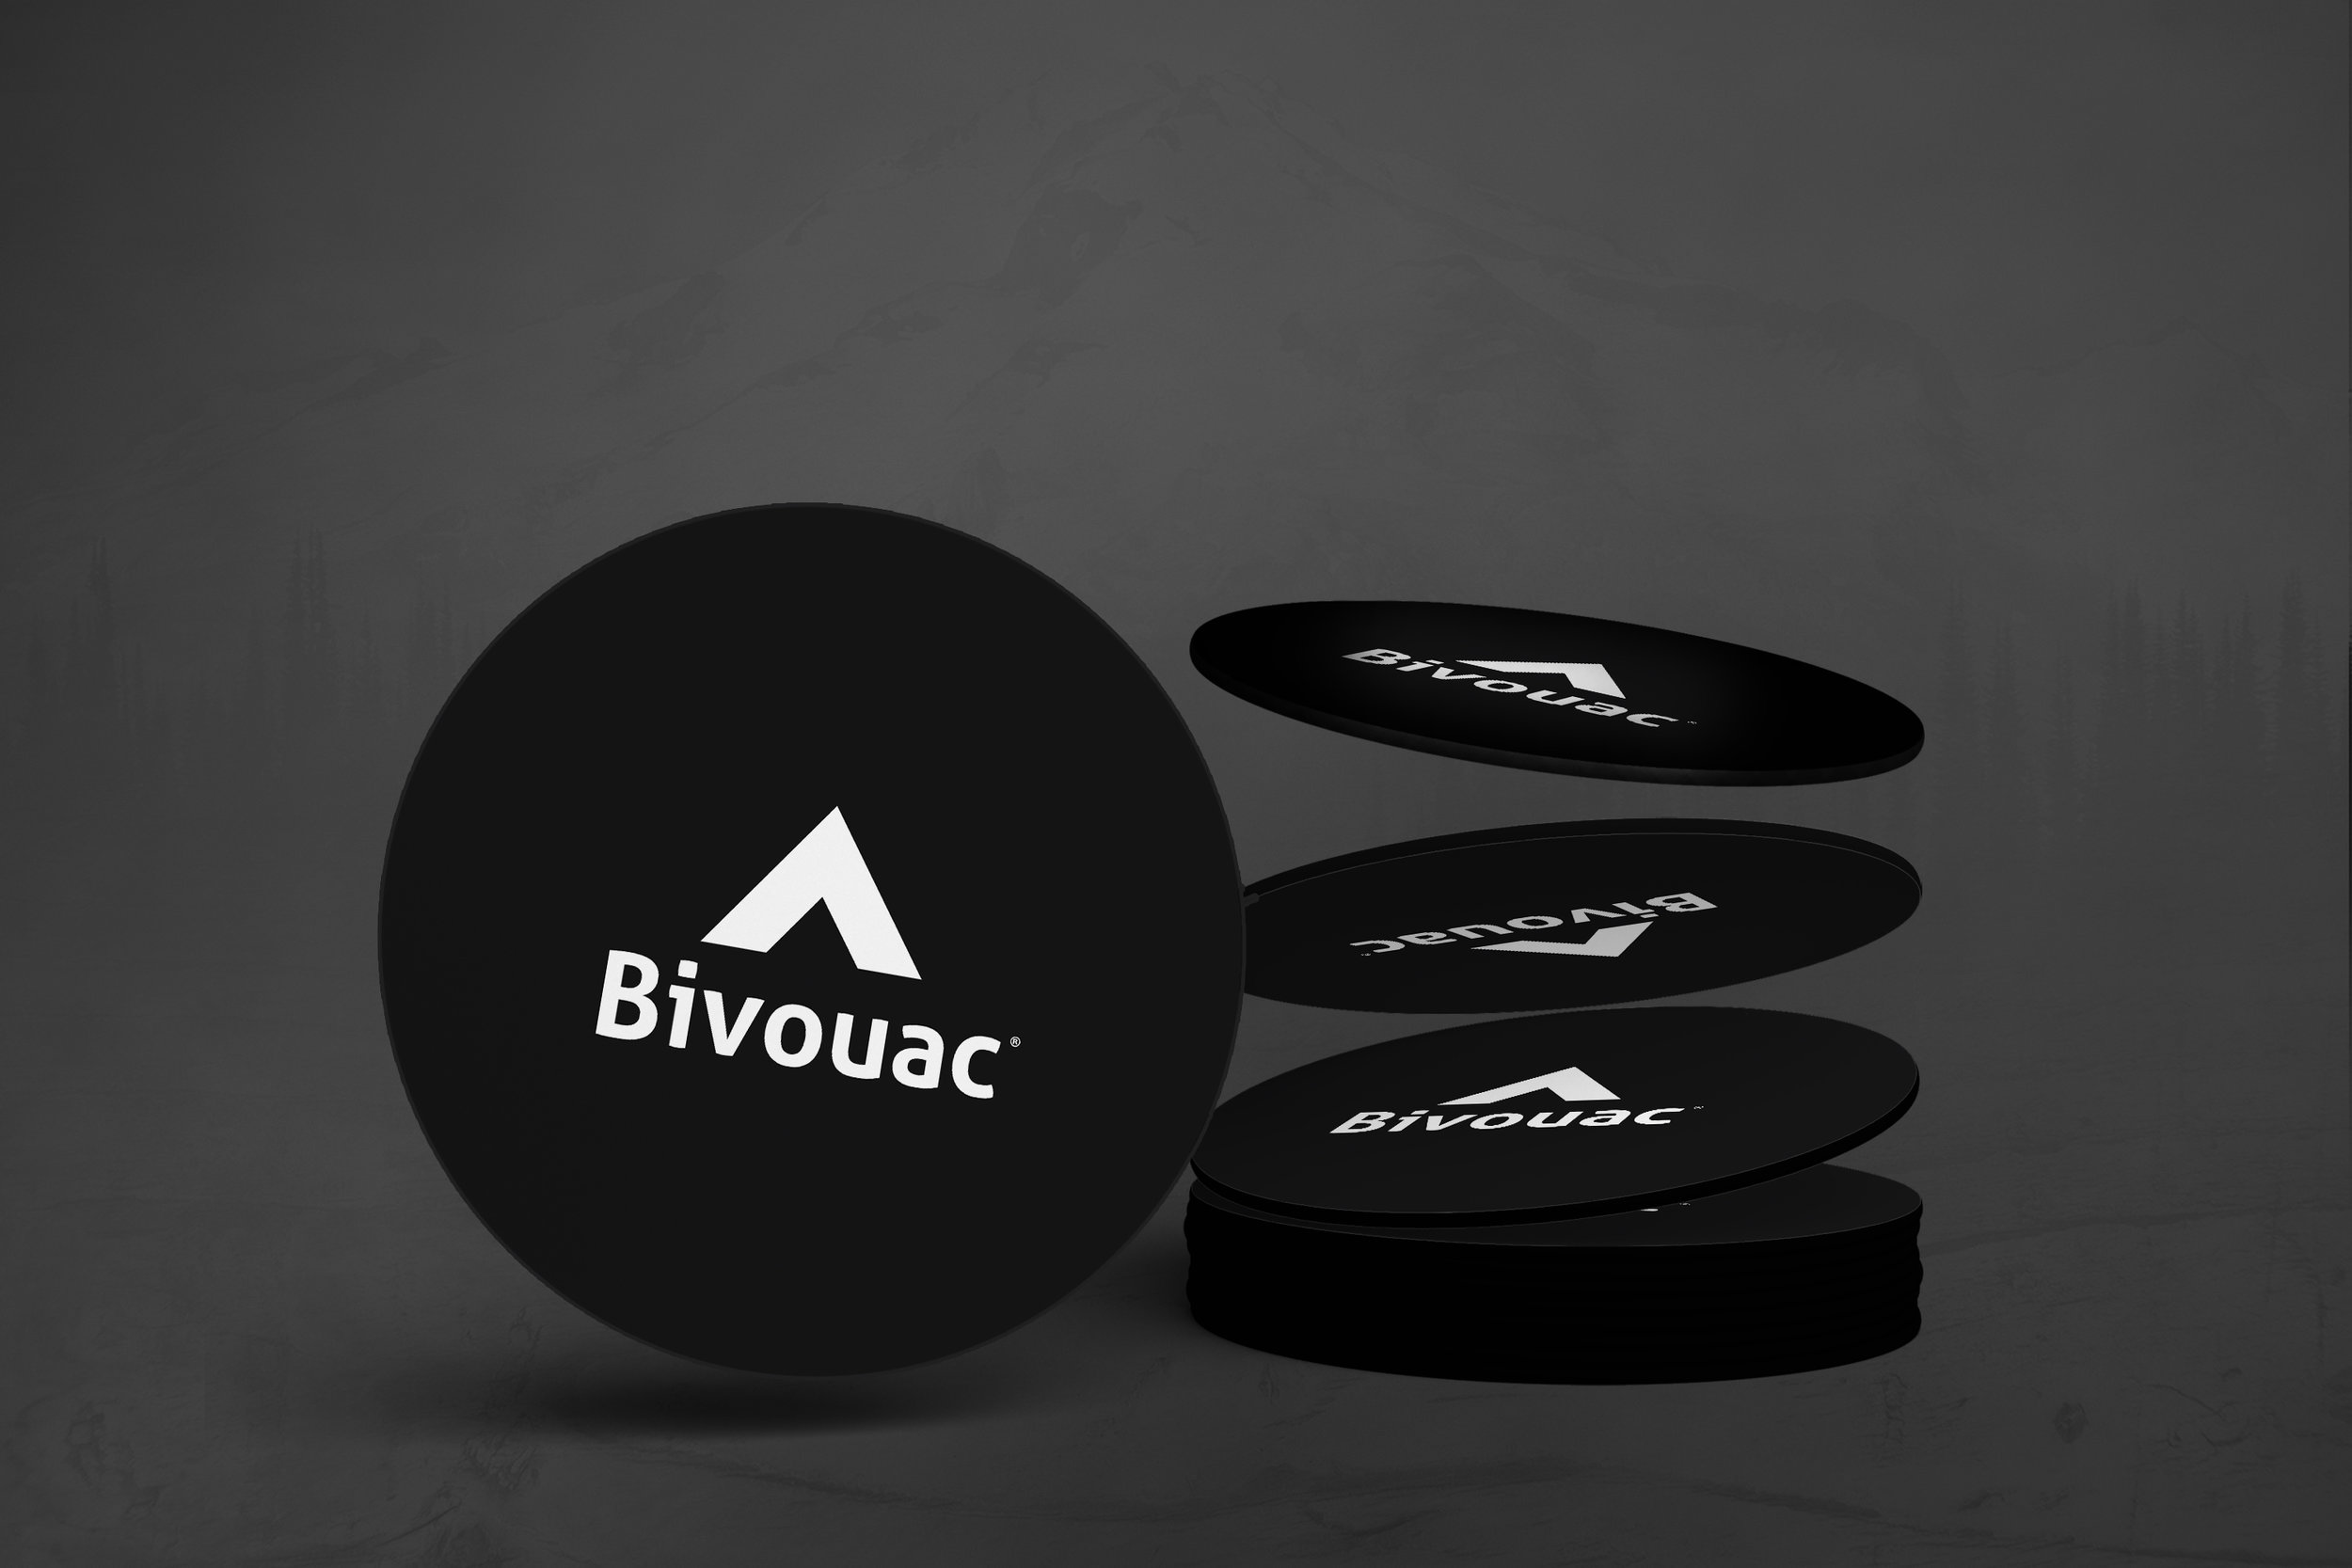 bivouac_coasters.jpg